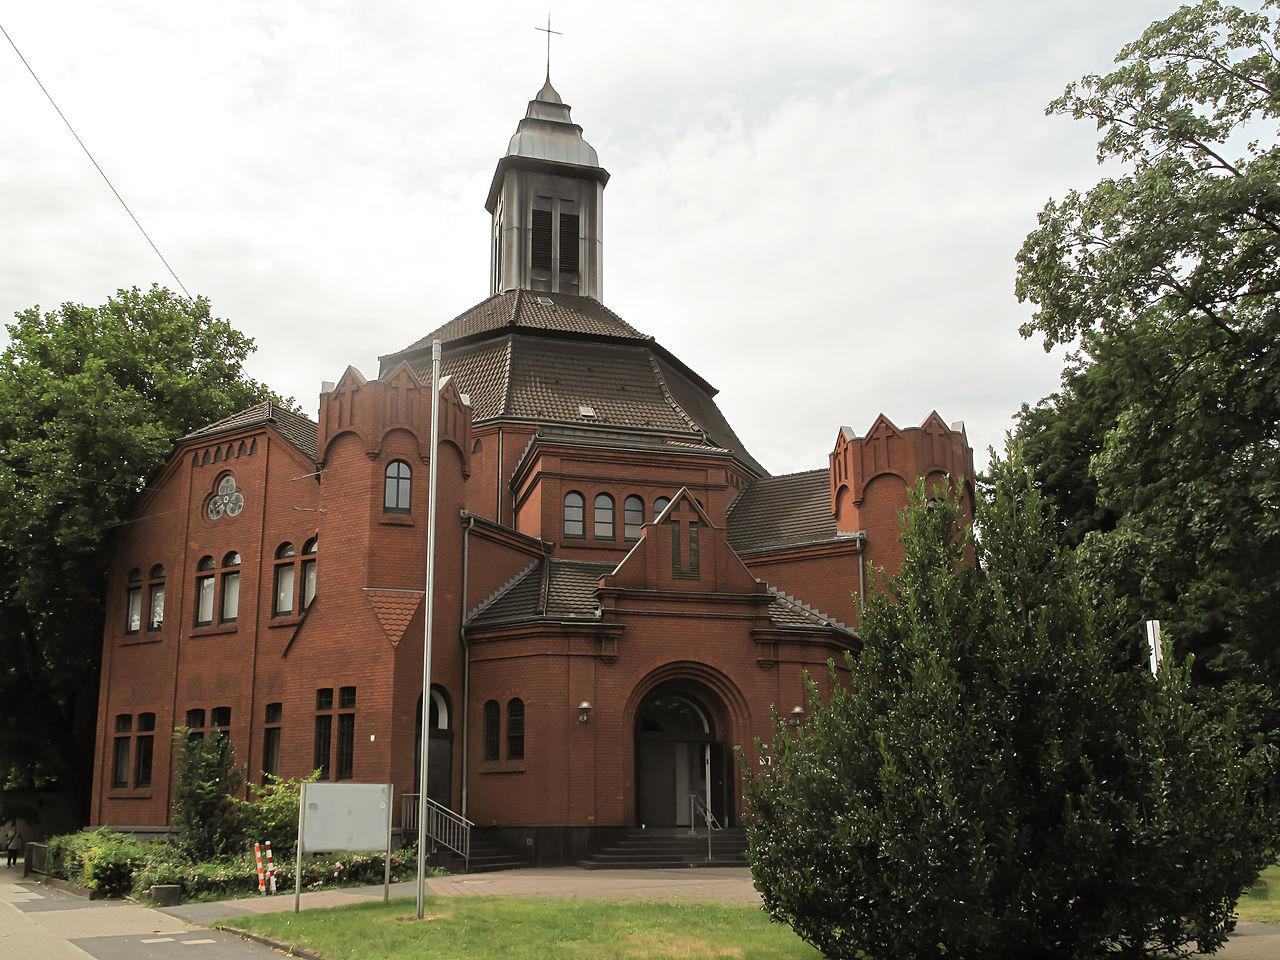 Bild Pauluskirche Oberhausen